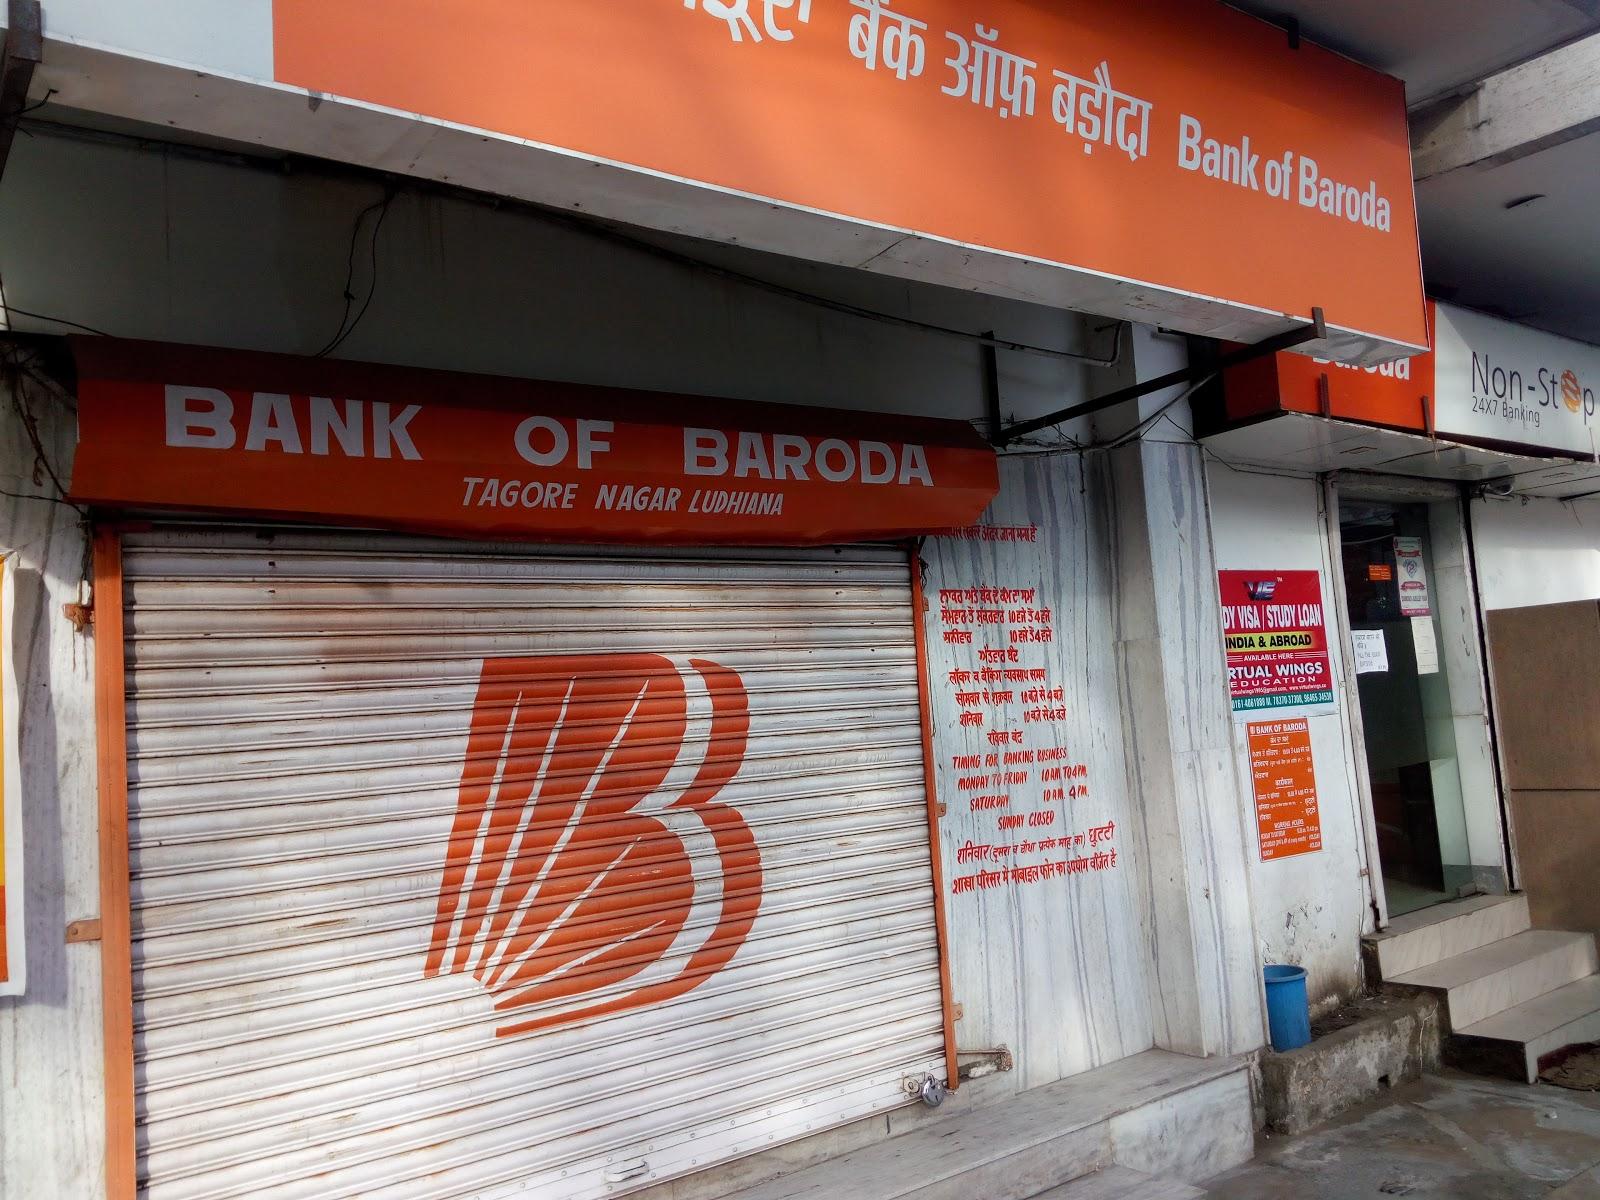 blood bank Bank Of Baroda near Ludhiana Punjab